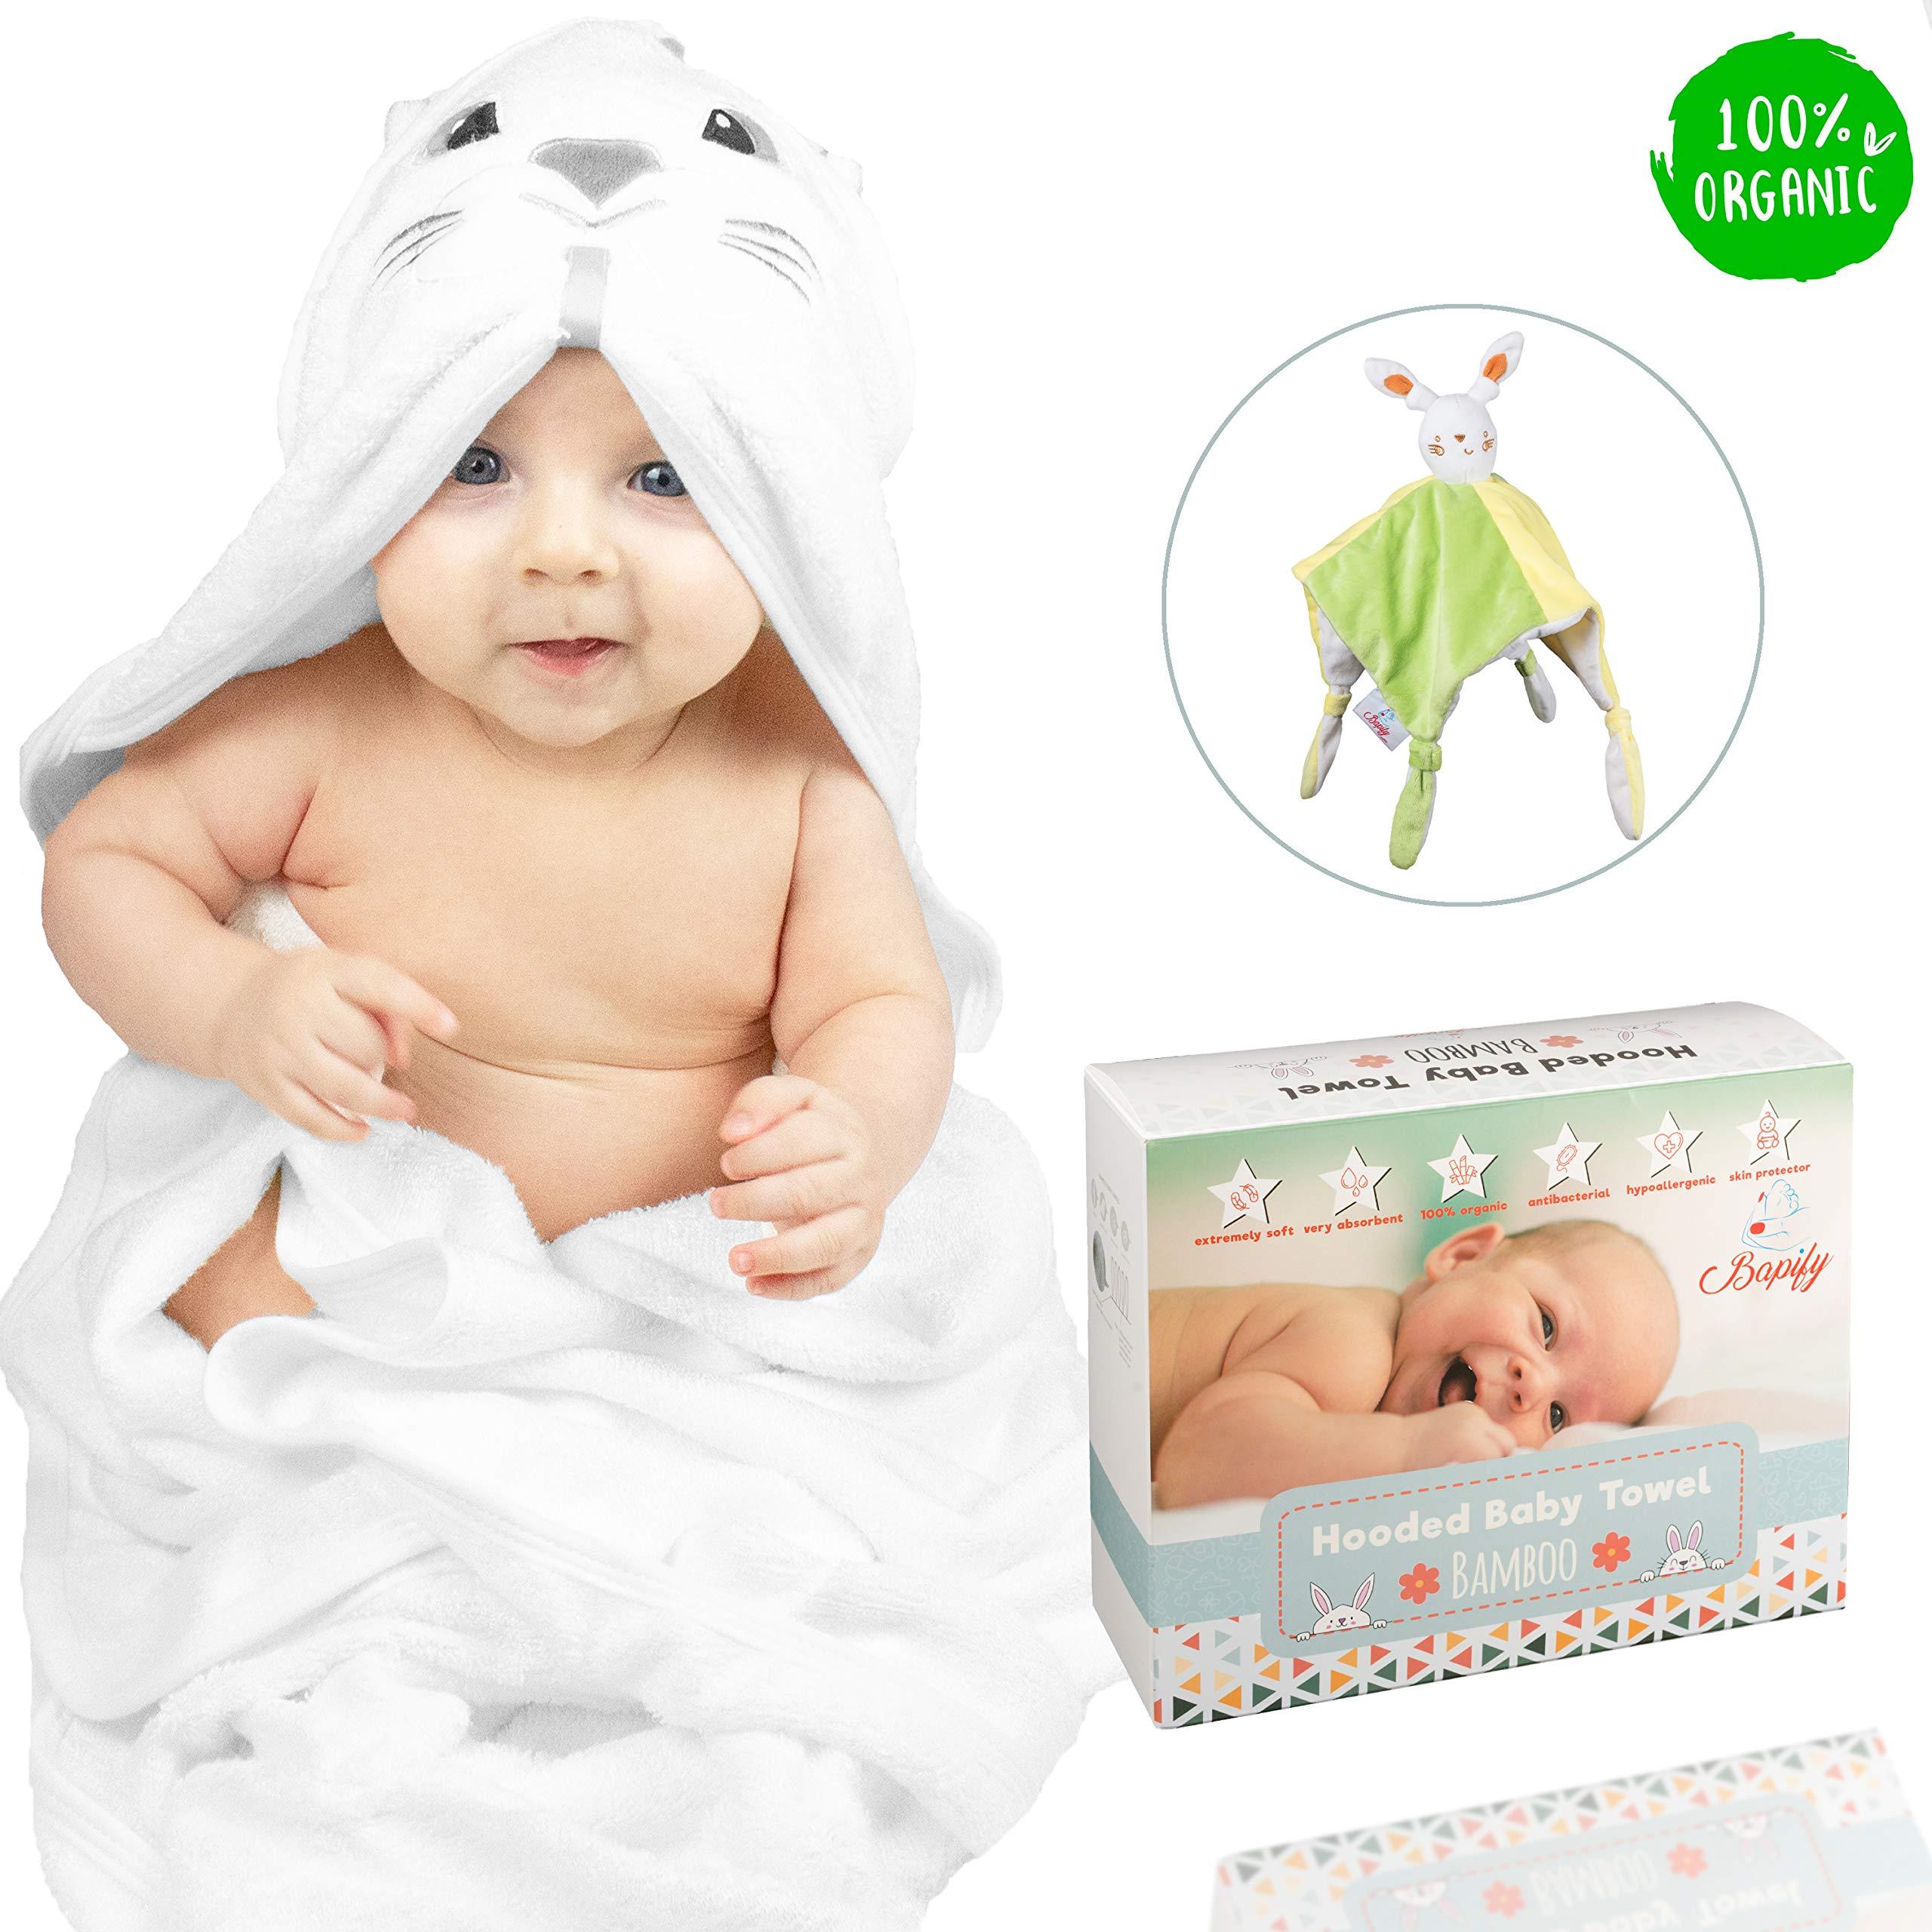 CUHAWUDBA Baby Bath Towels Muslin Washcloths,Super Soft and Absorbent 6 Layers 100/% Medical Grade Natural Cotton Gauze for Sensitive Skin and Babies Blue